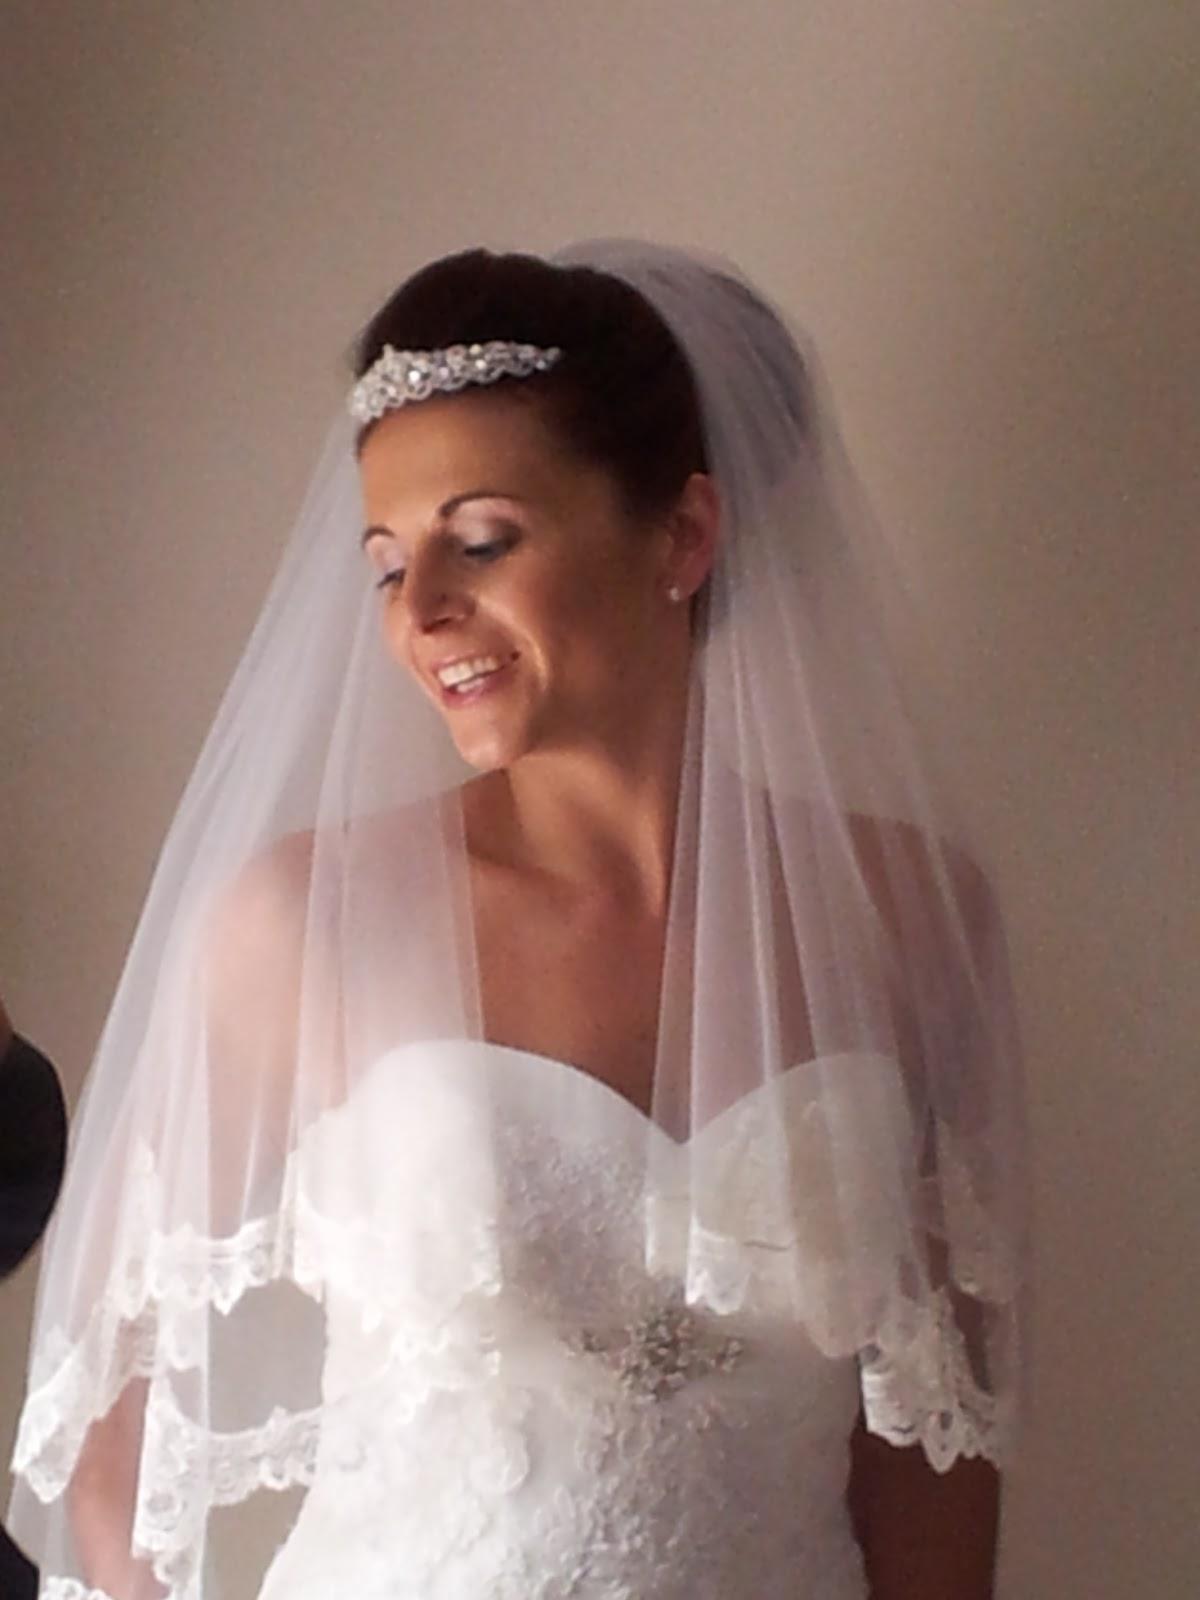 Wedding Veils With Tiaras